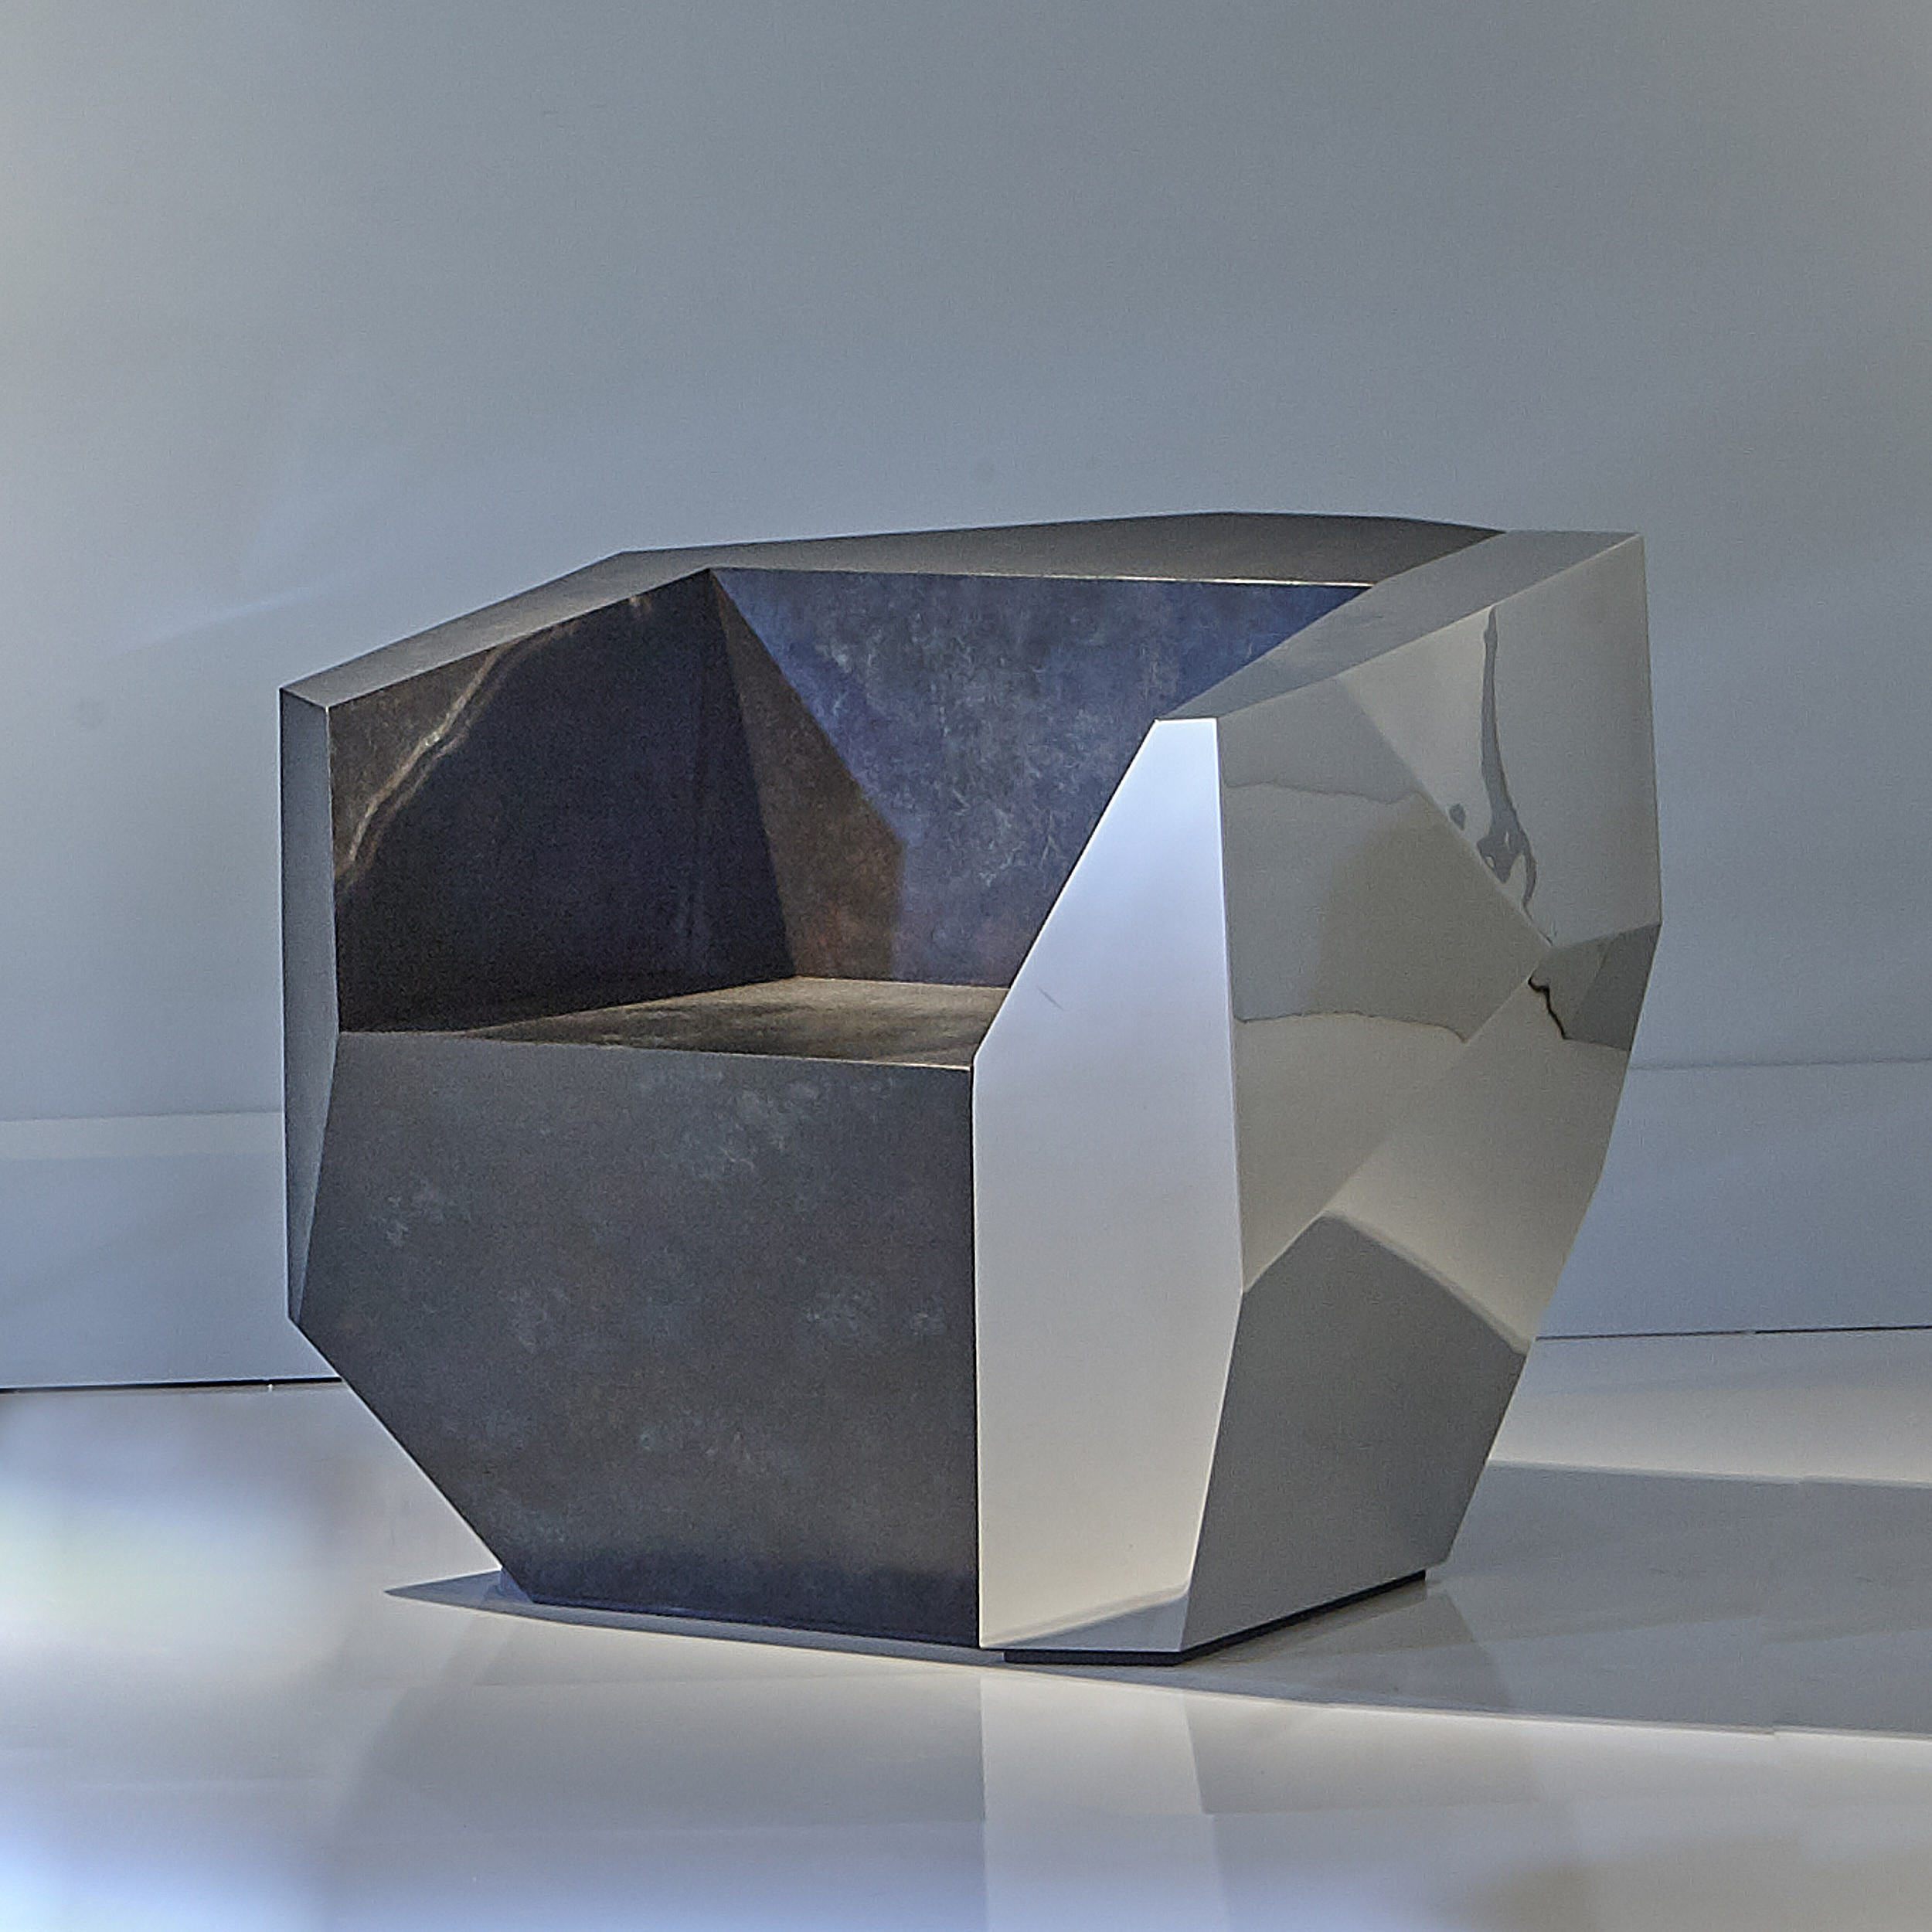 5.+DL+Armchair+%27Elemental+Split+Unit%27.jpg